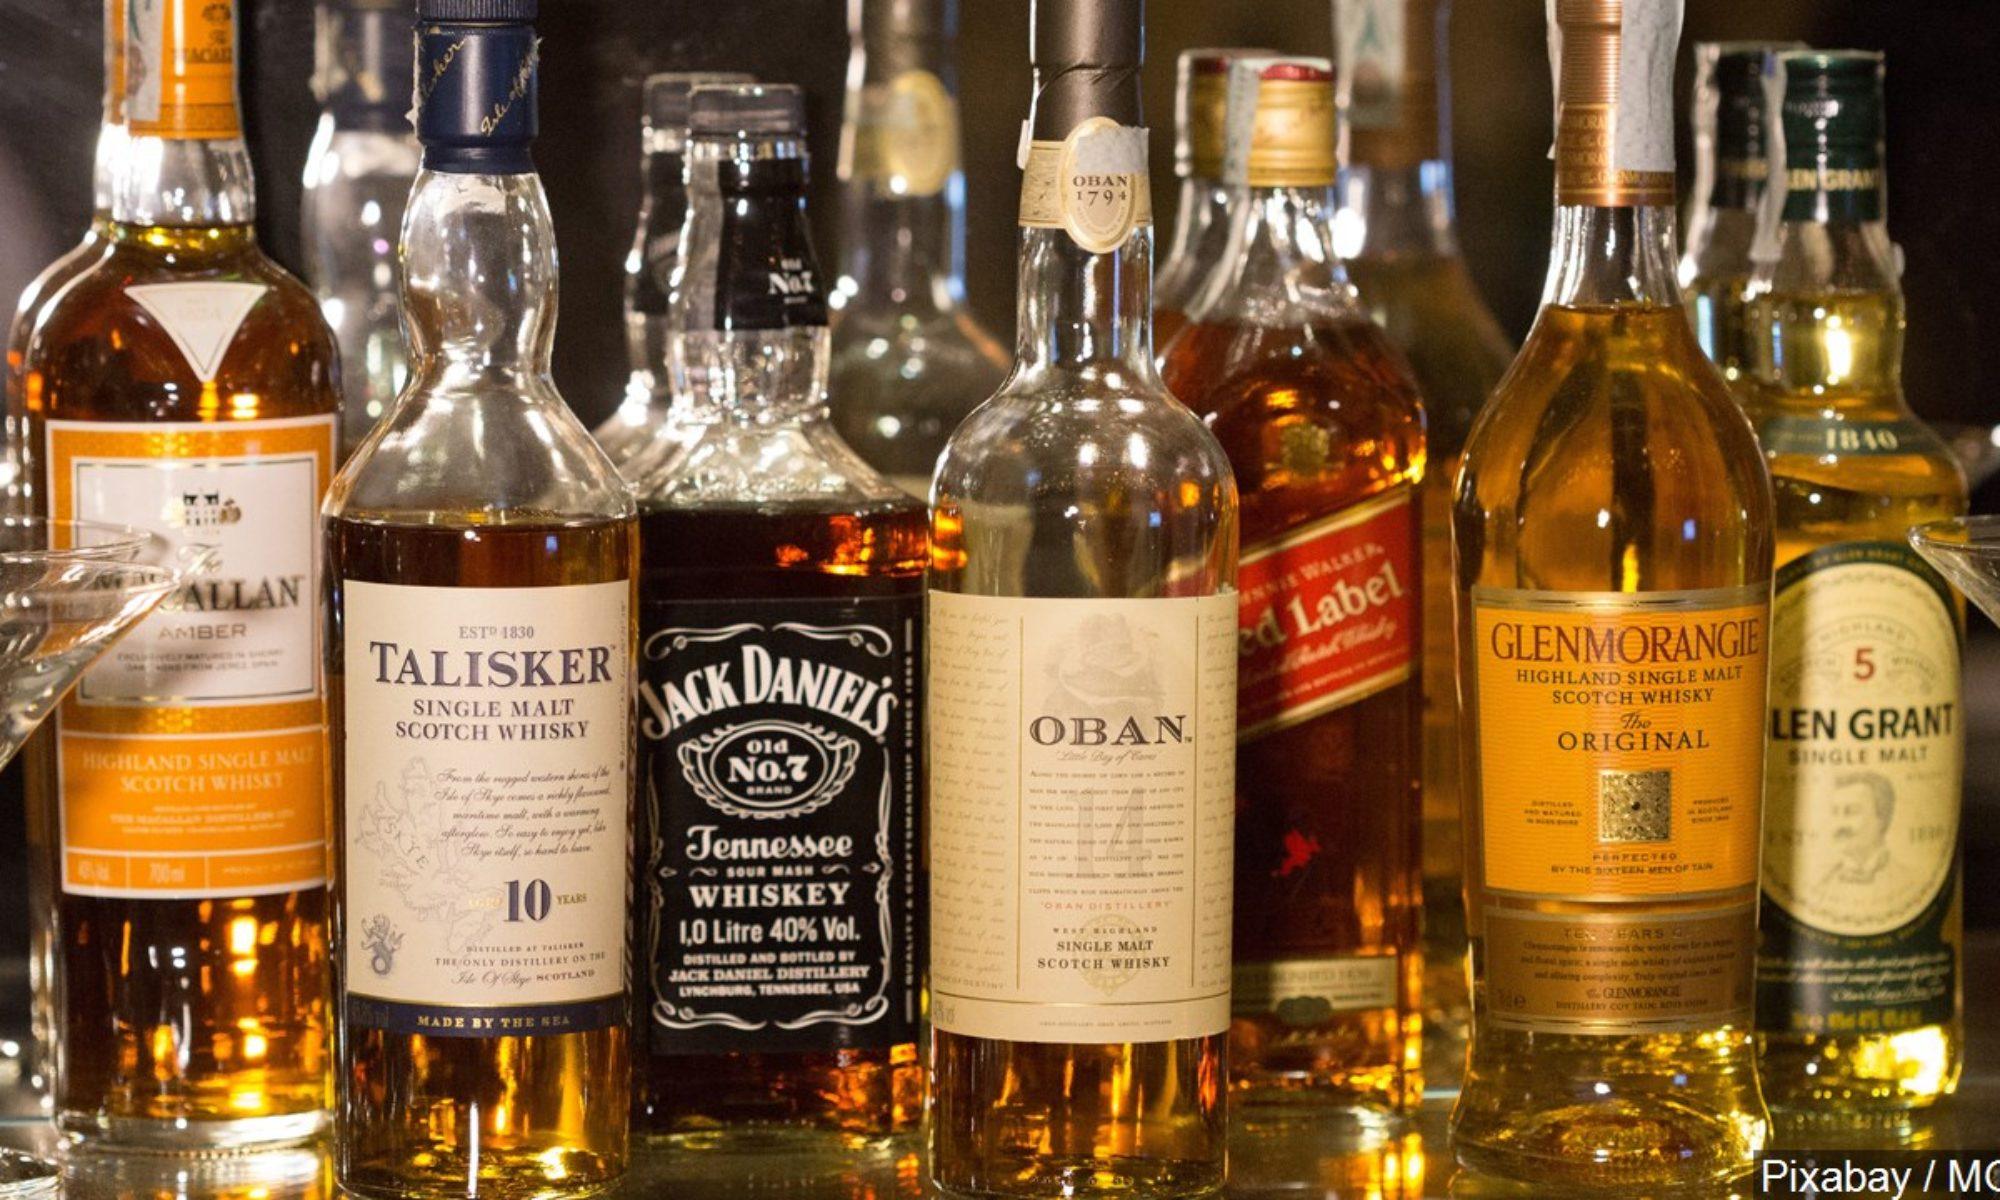 Clocktower Liquors